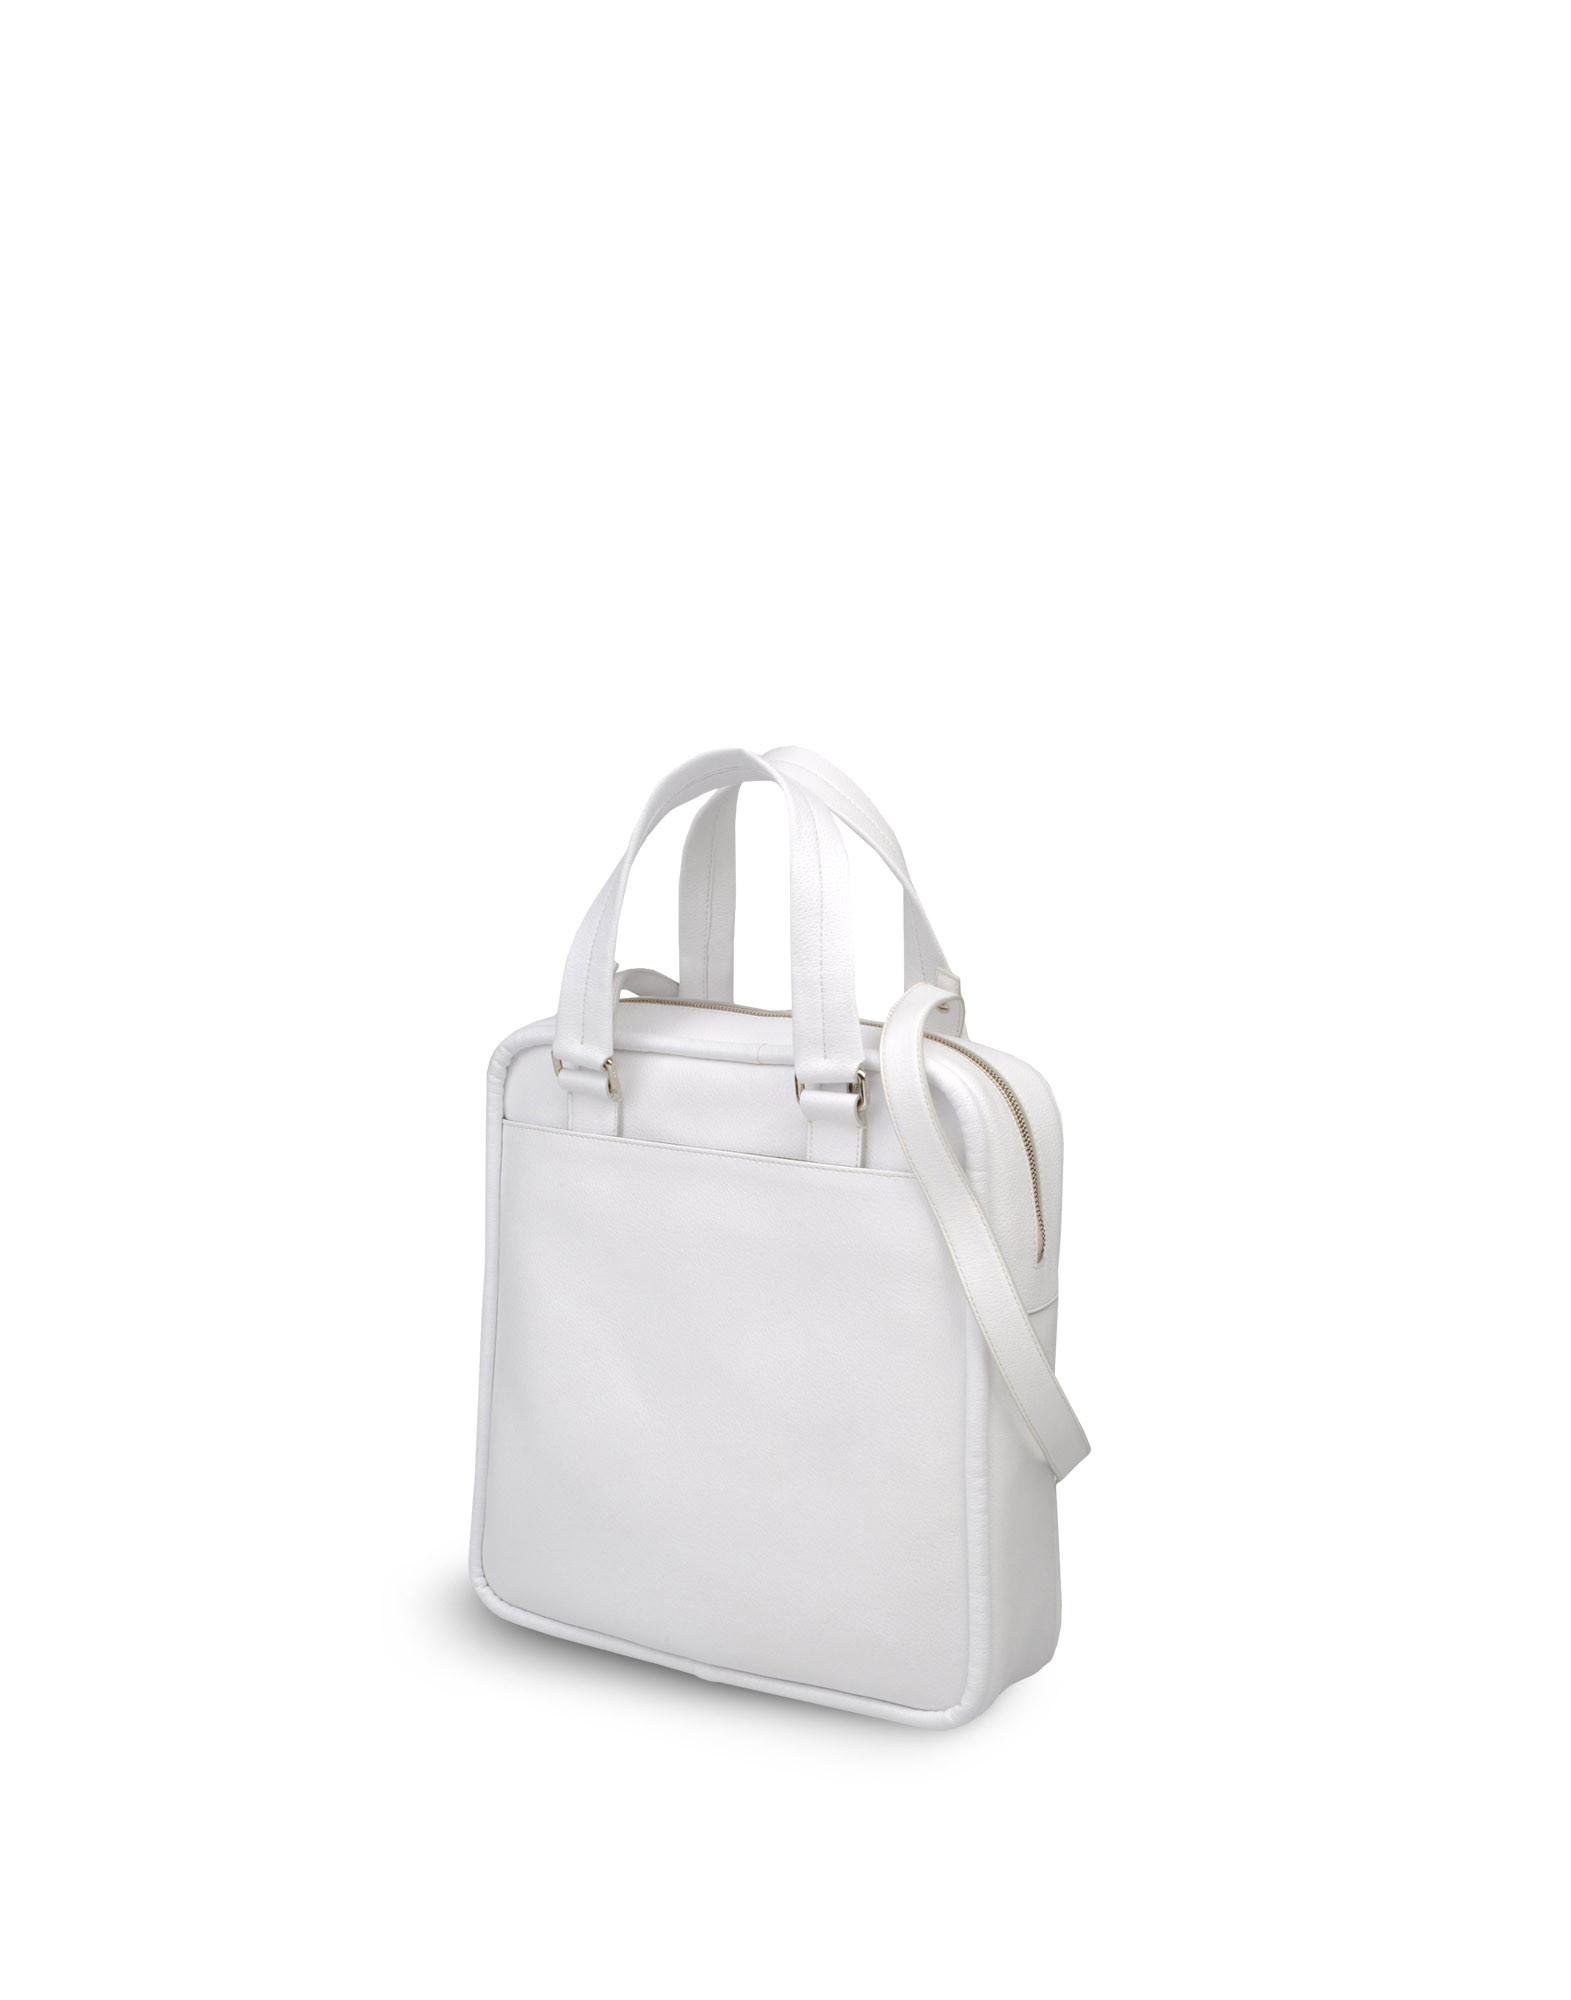 Handtasche - JIL SANDER NAVY Online Store